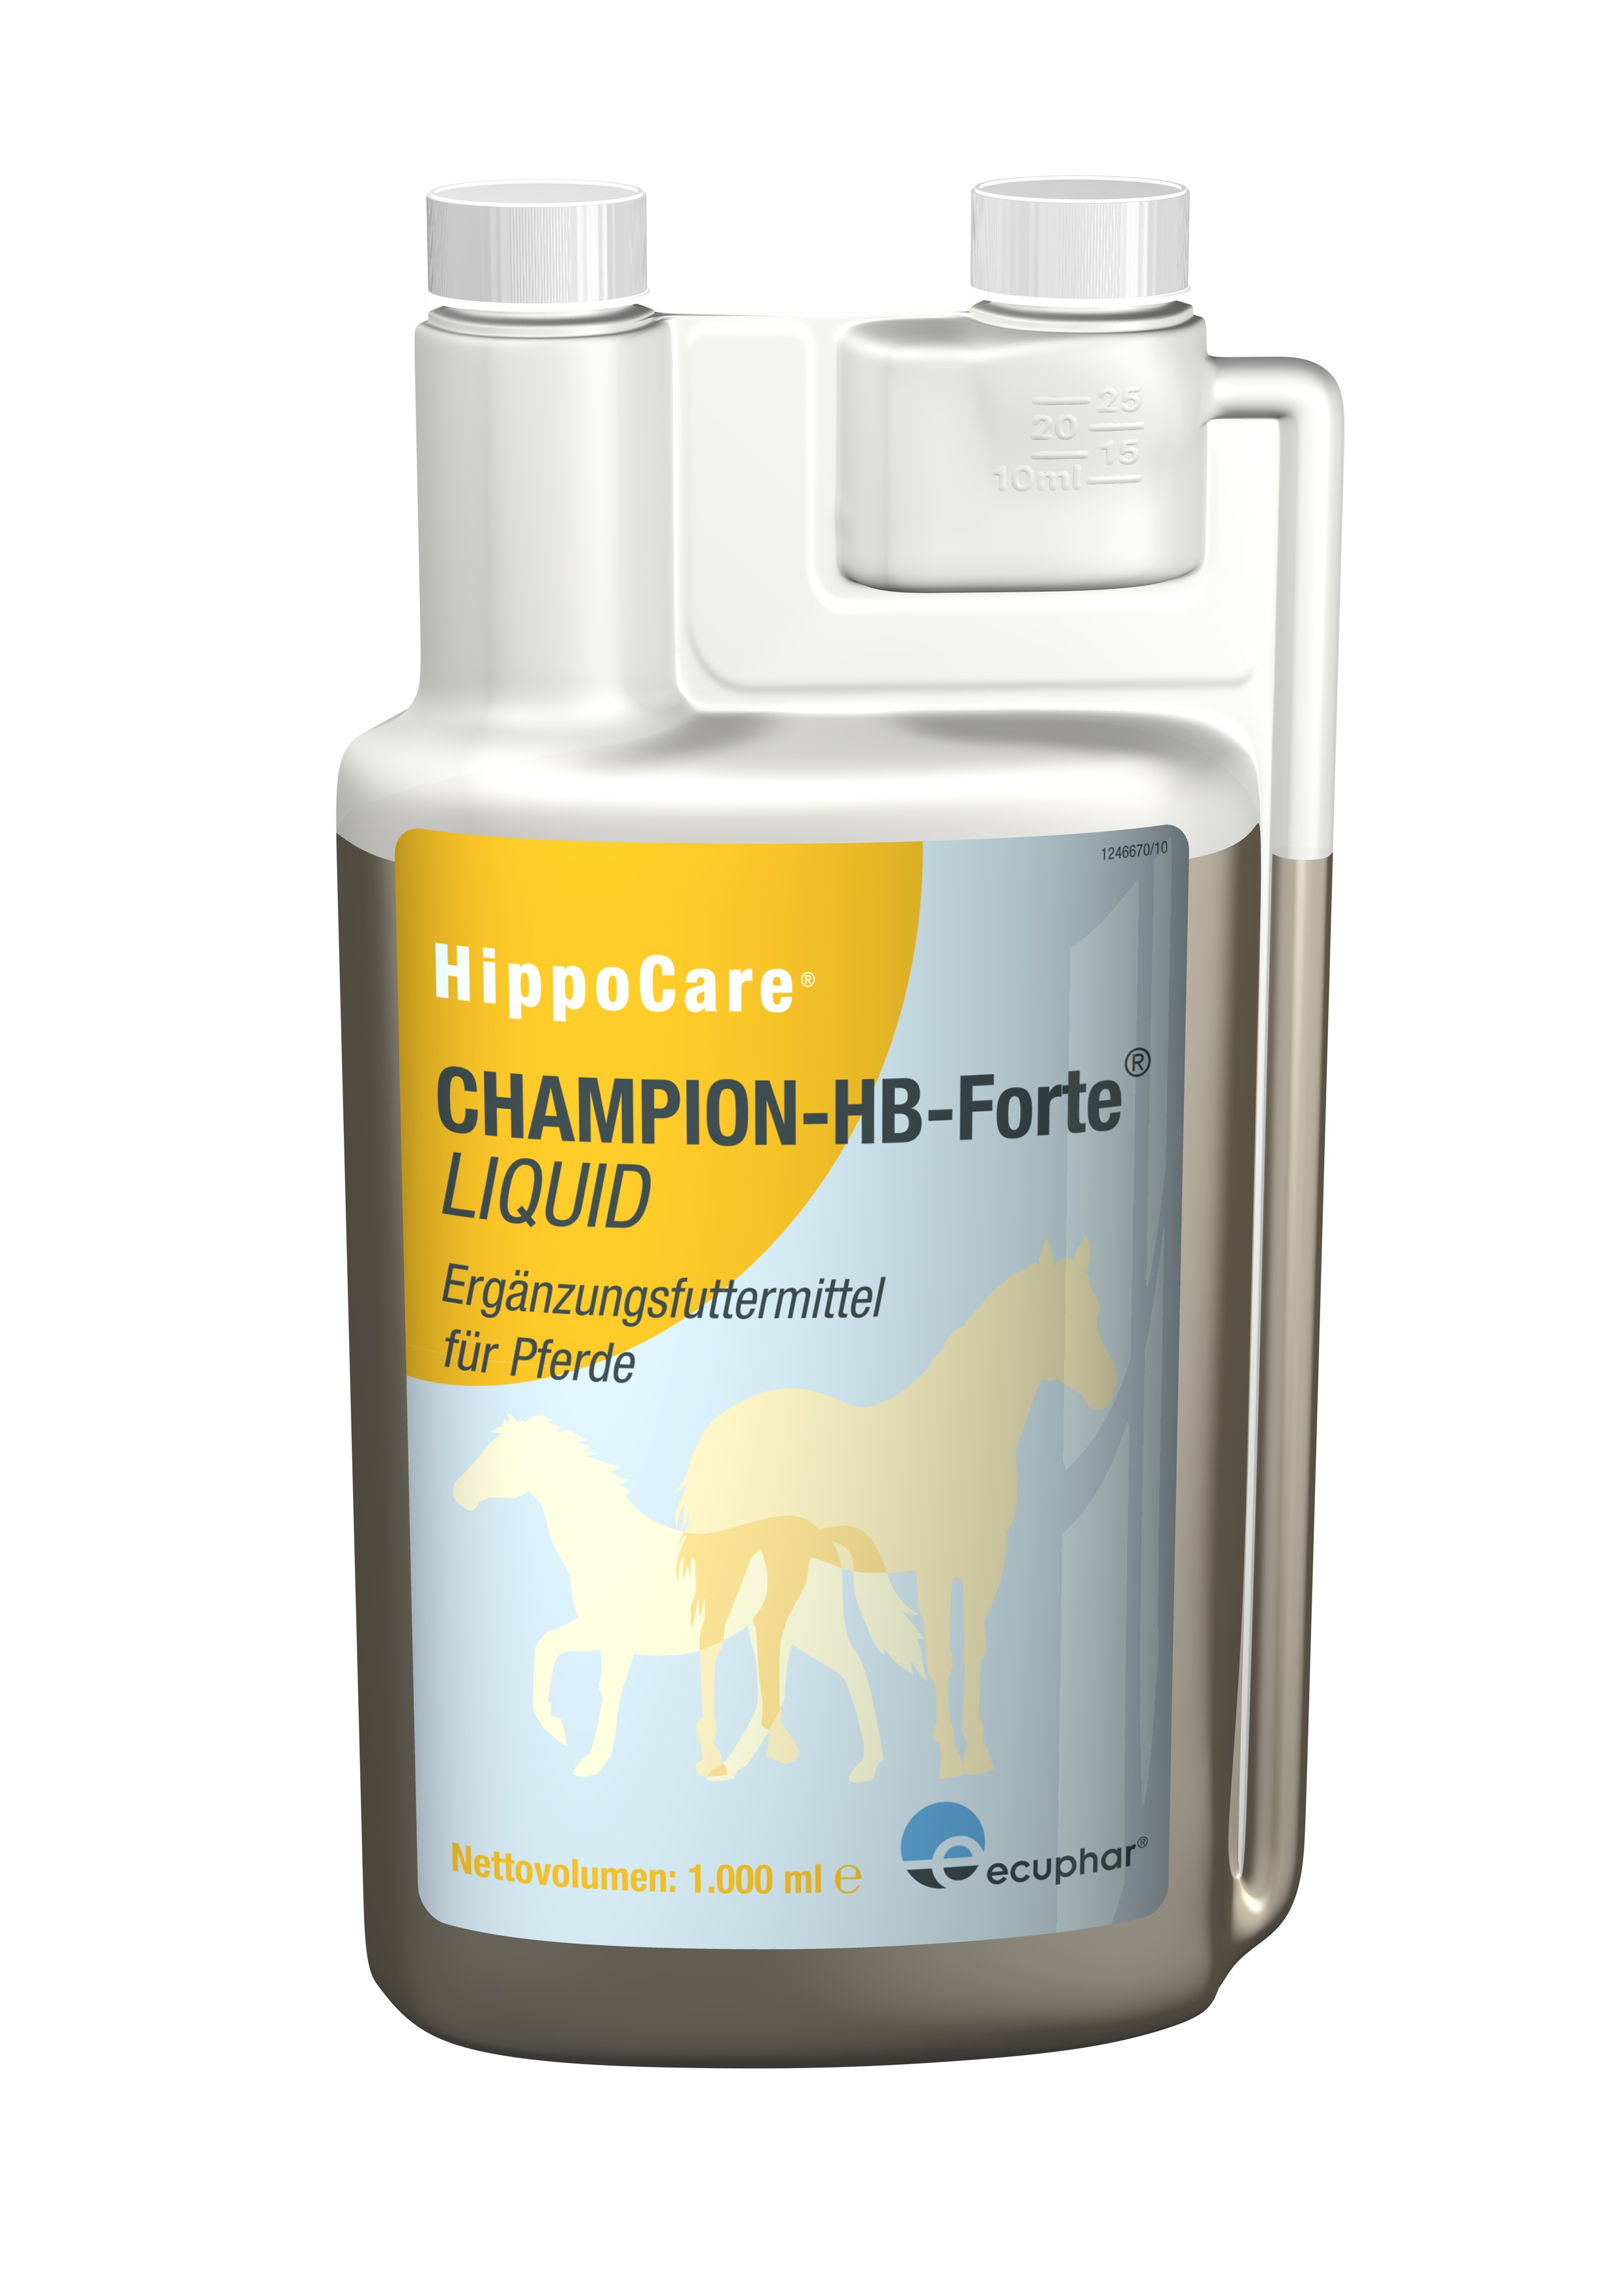 HippoCare Champion-HB-Forte Liquid